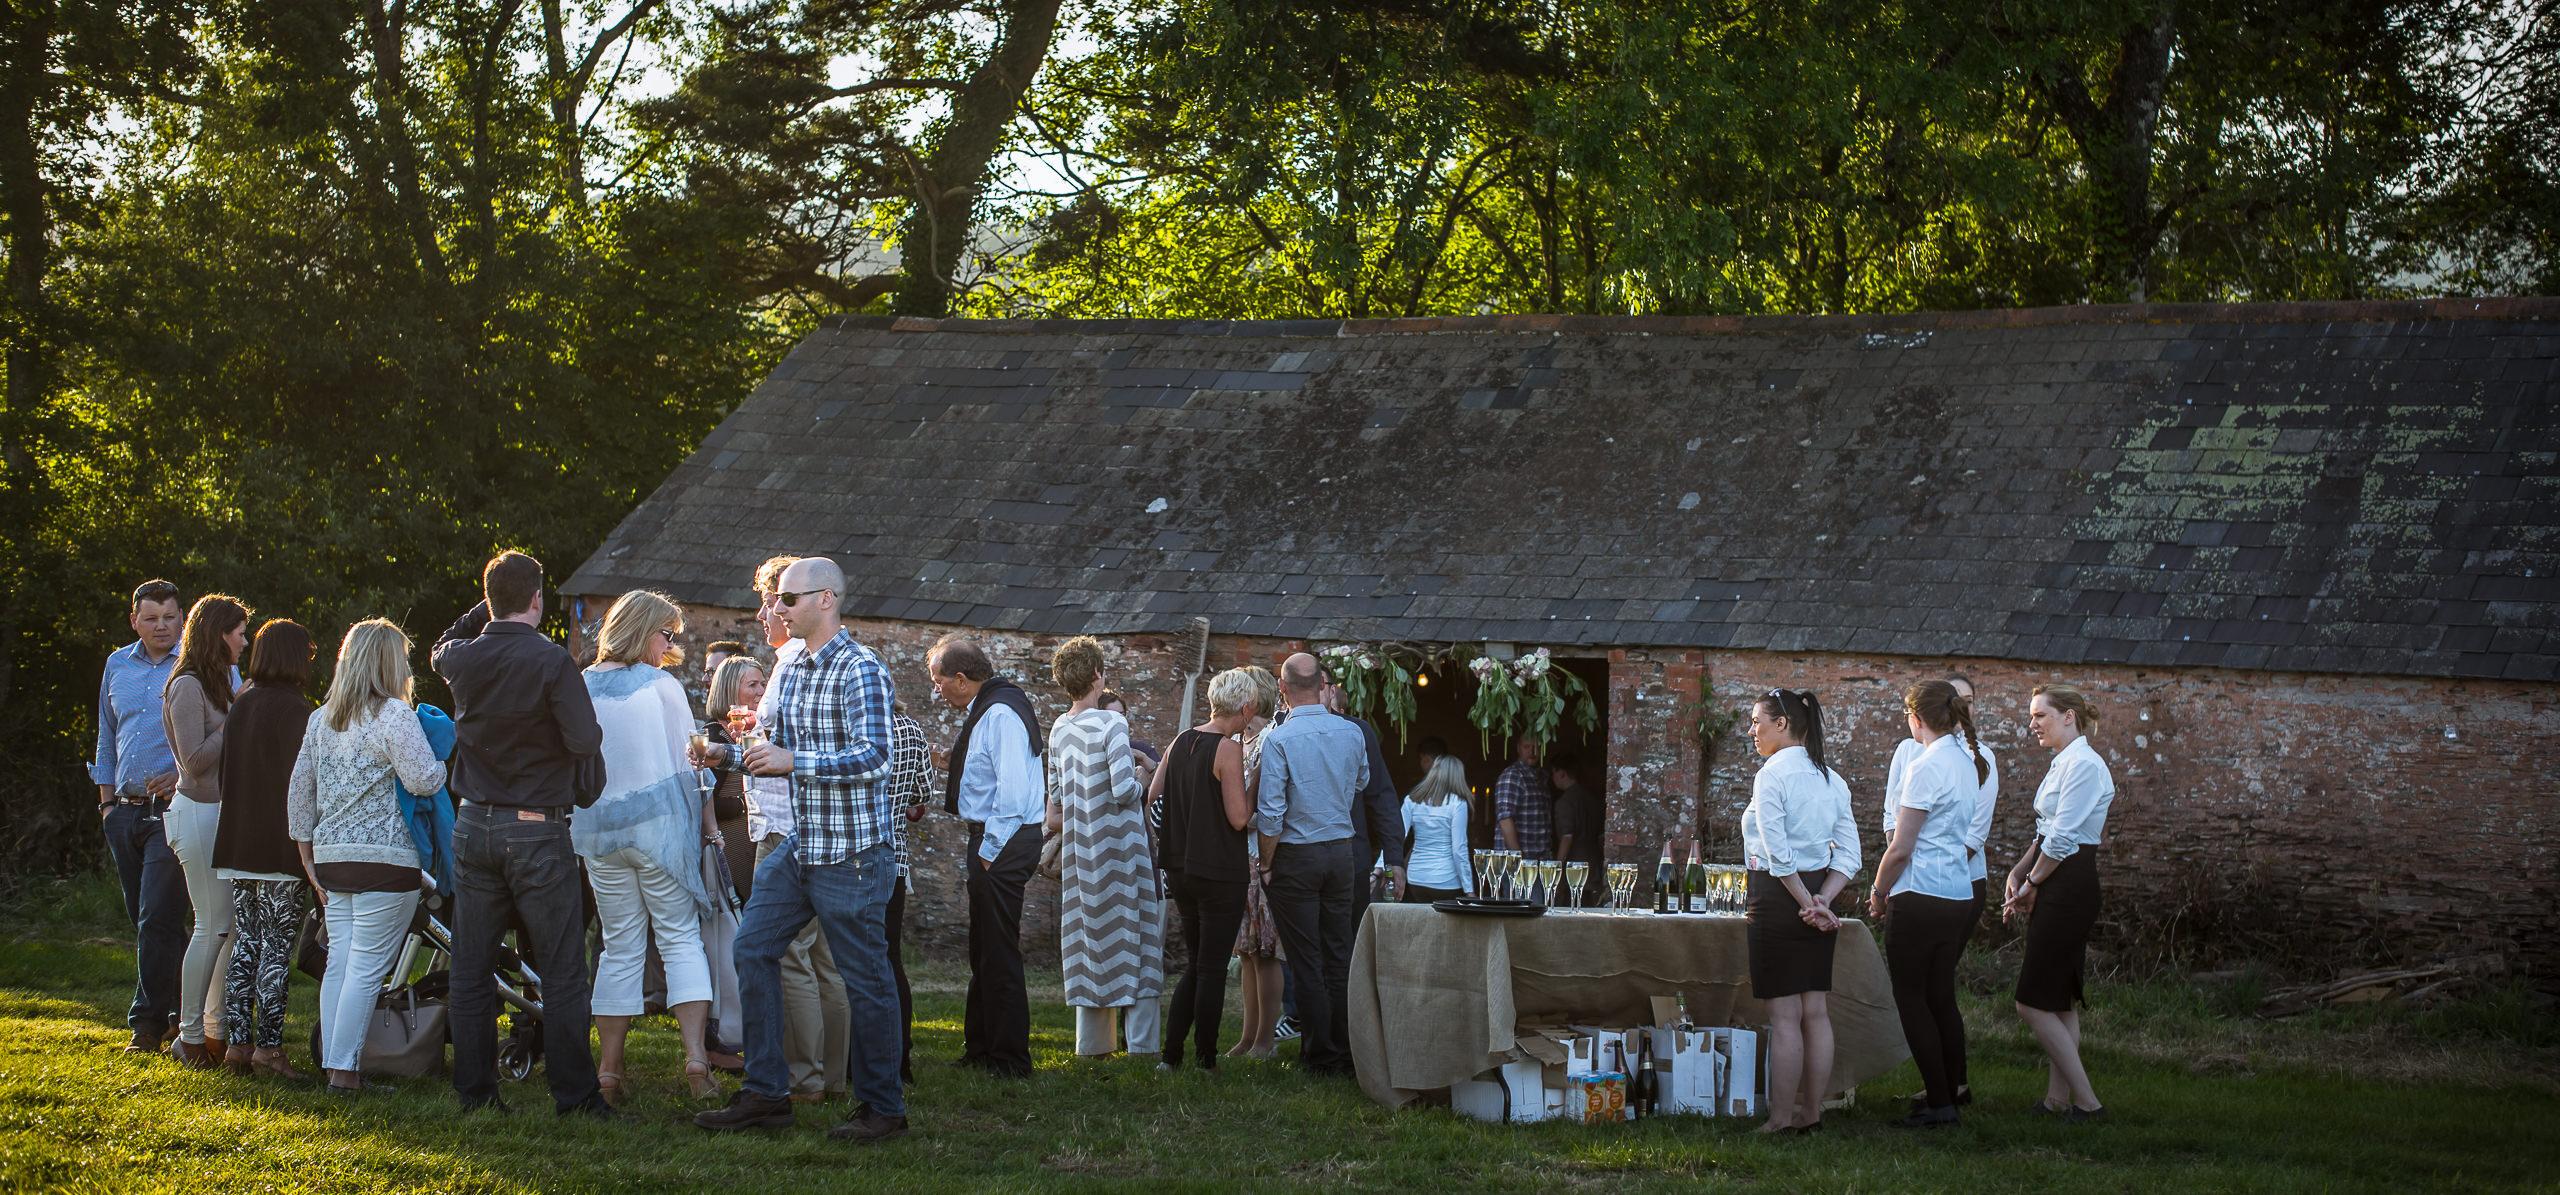 Wedding Gallery On The Farm By Brett Leica Photographer 06